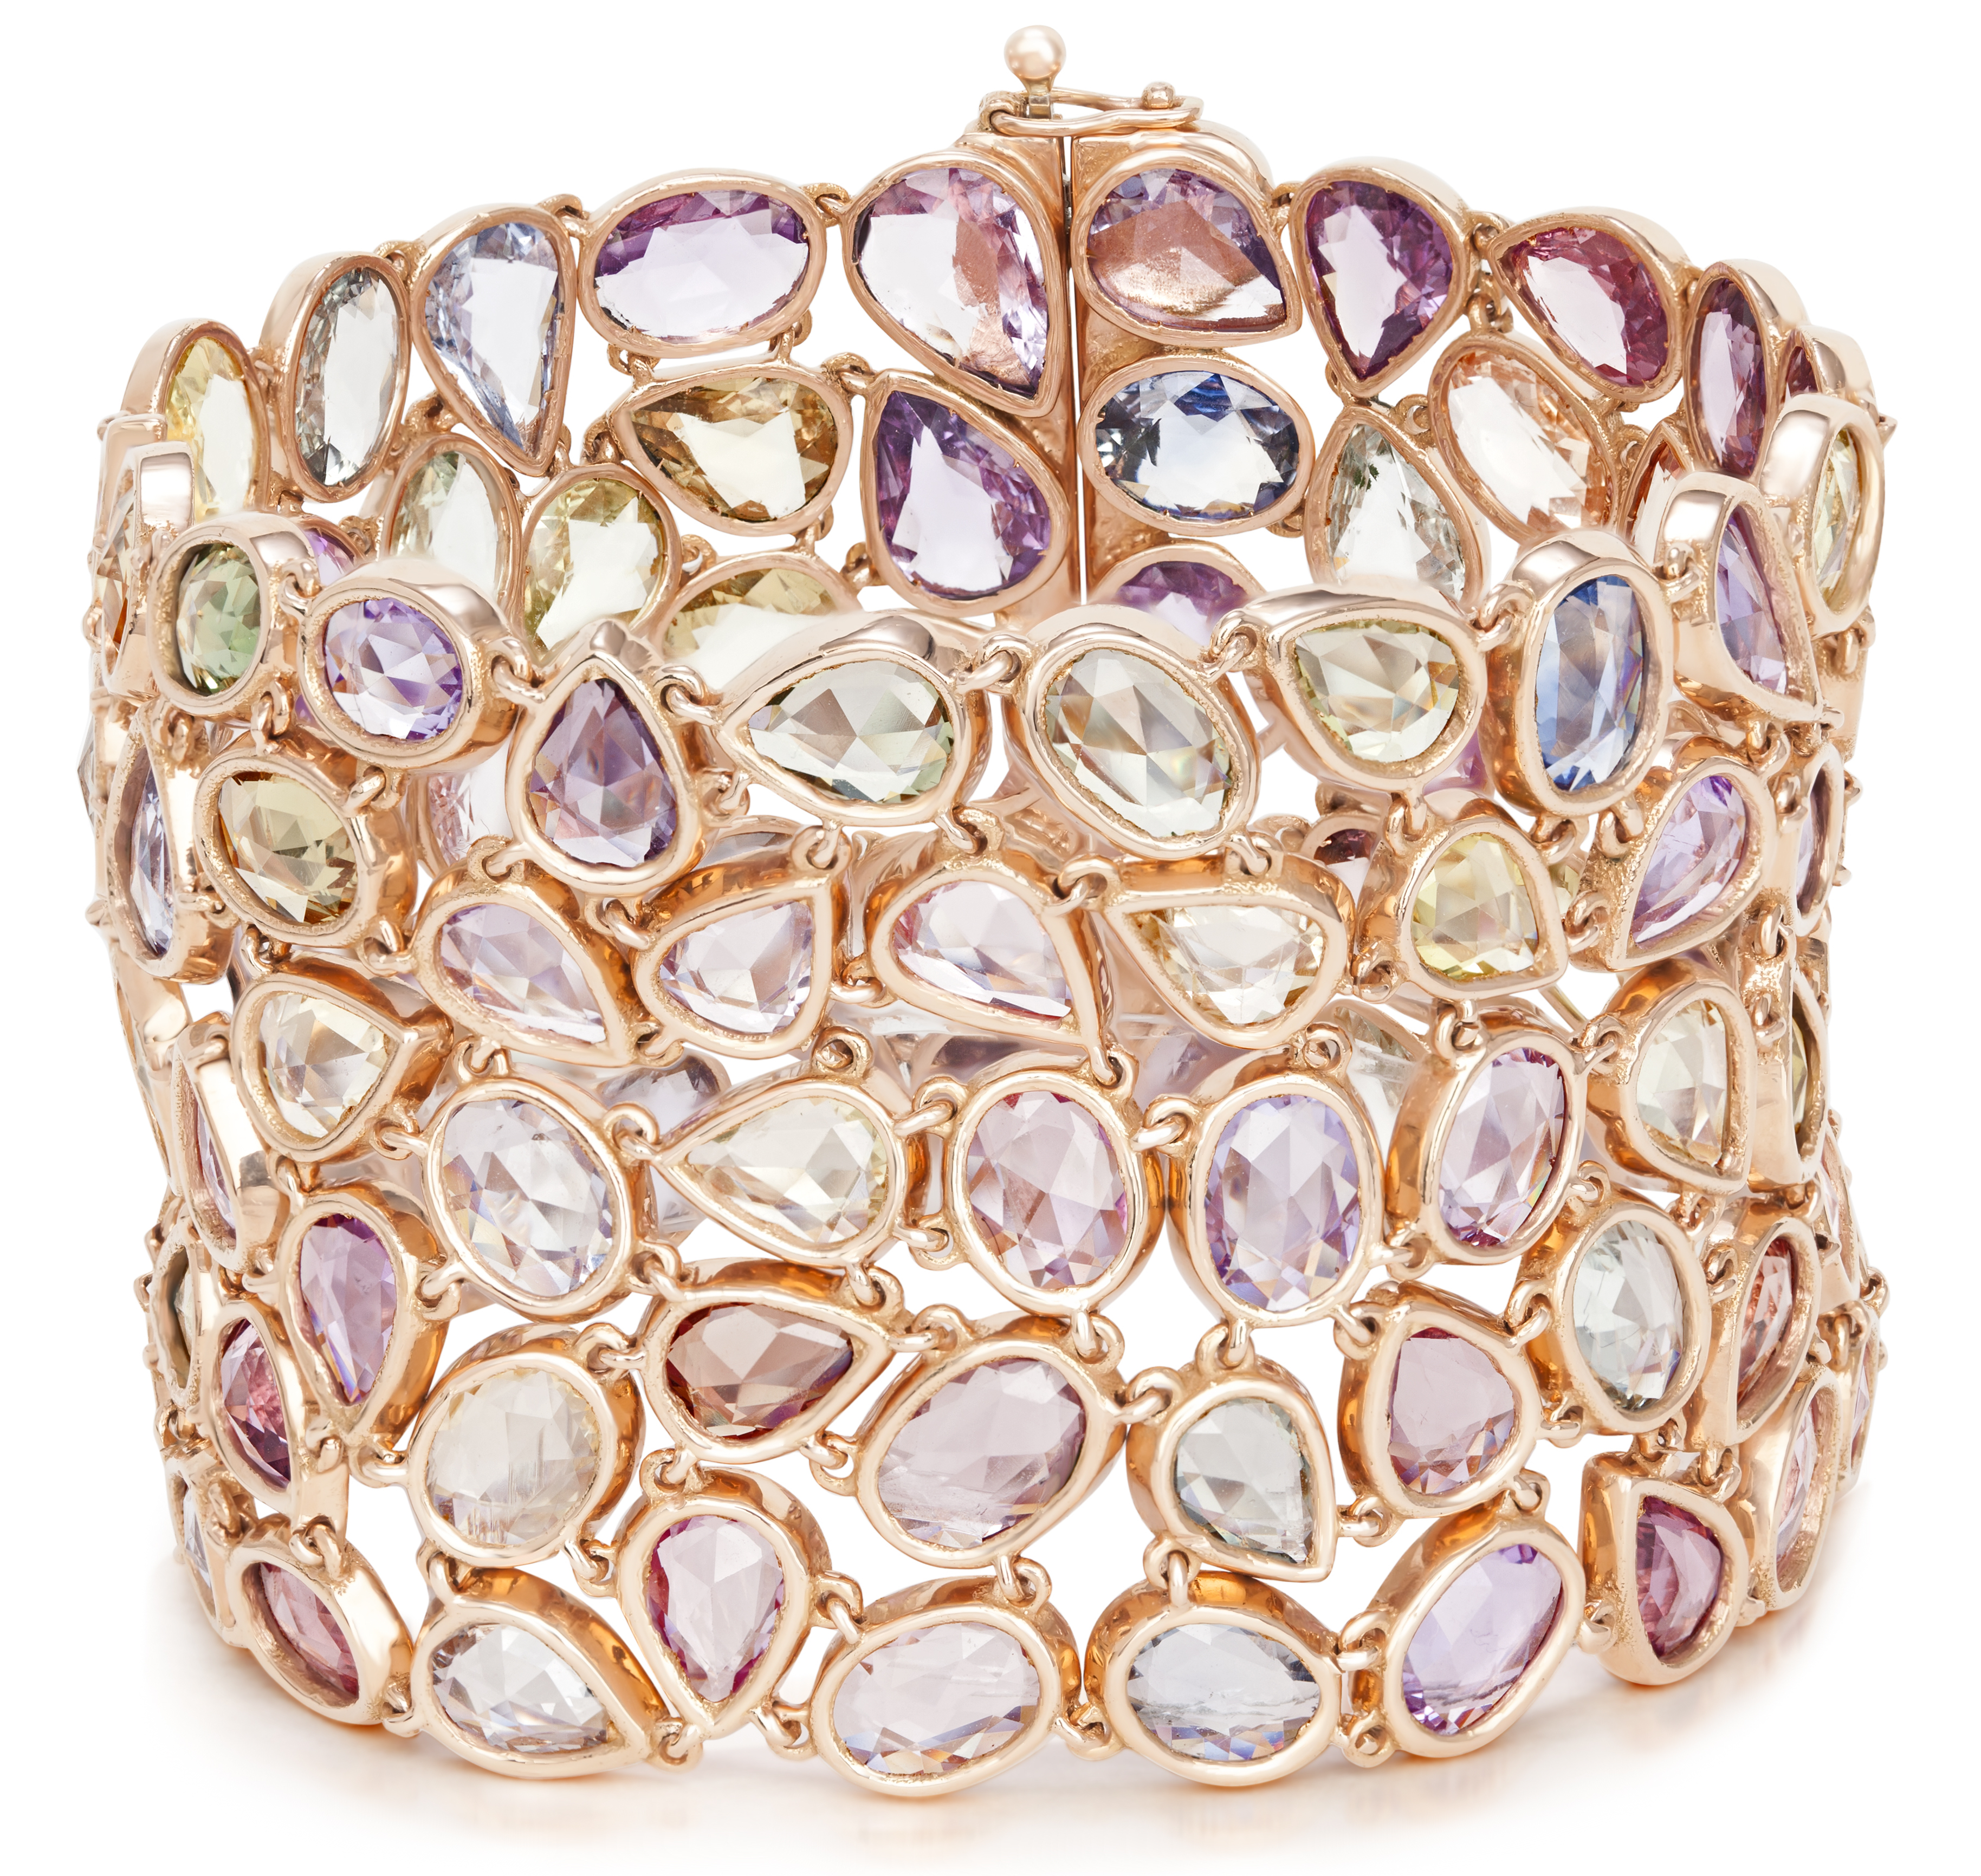 VTse multicolor spinel bracelet | JCK On Your Market